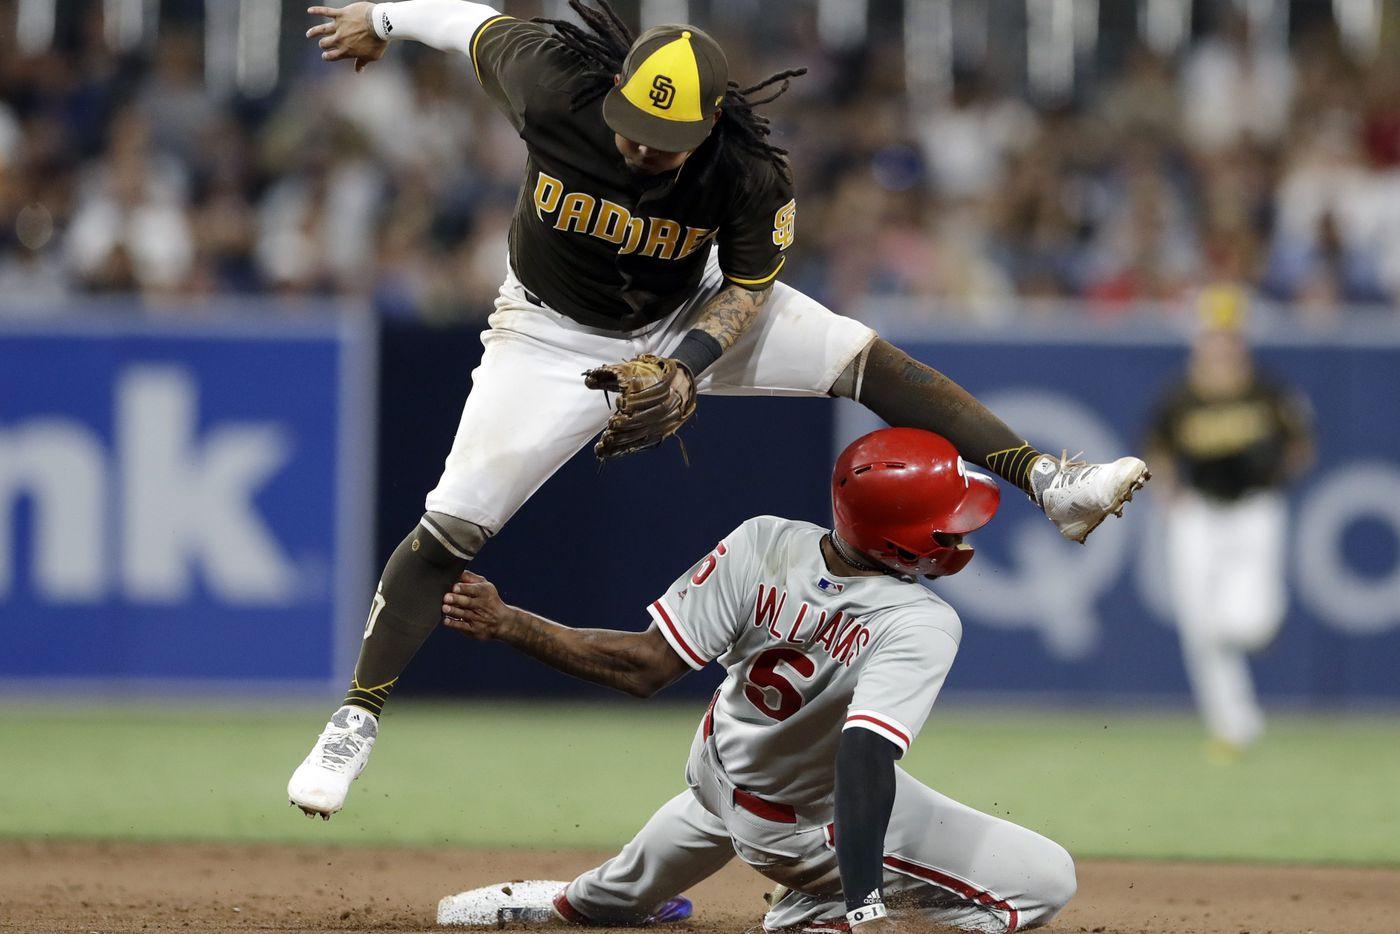 Phillies' scoreless streak reaches 19 innings after shutout loss to Padres